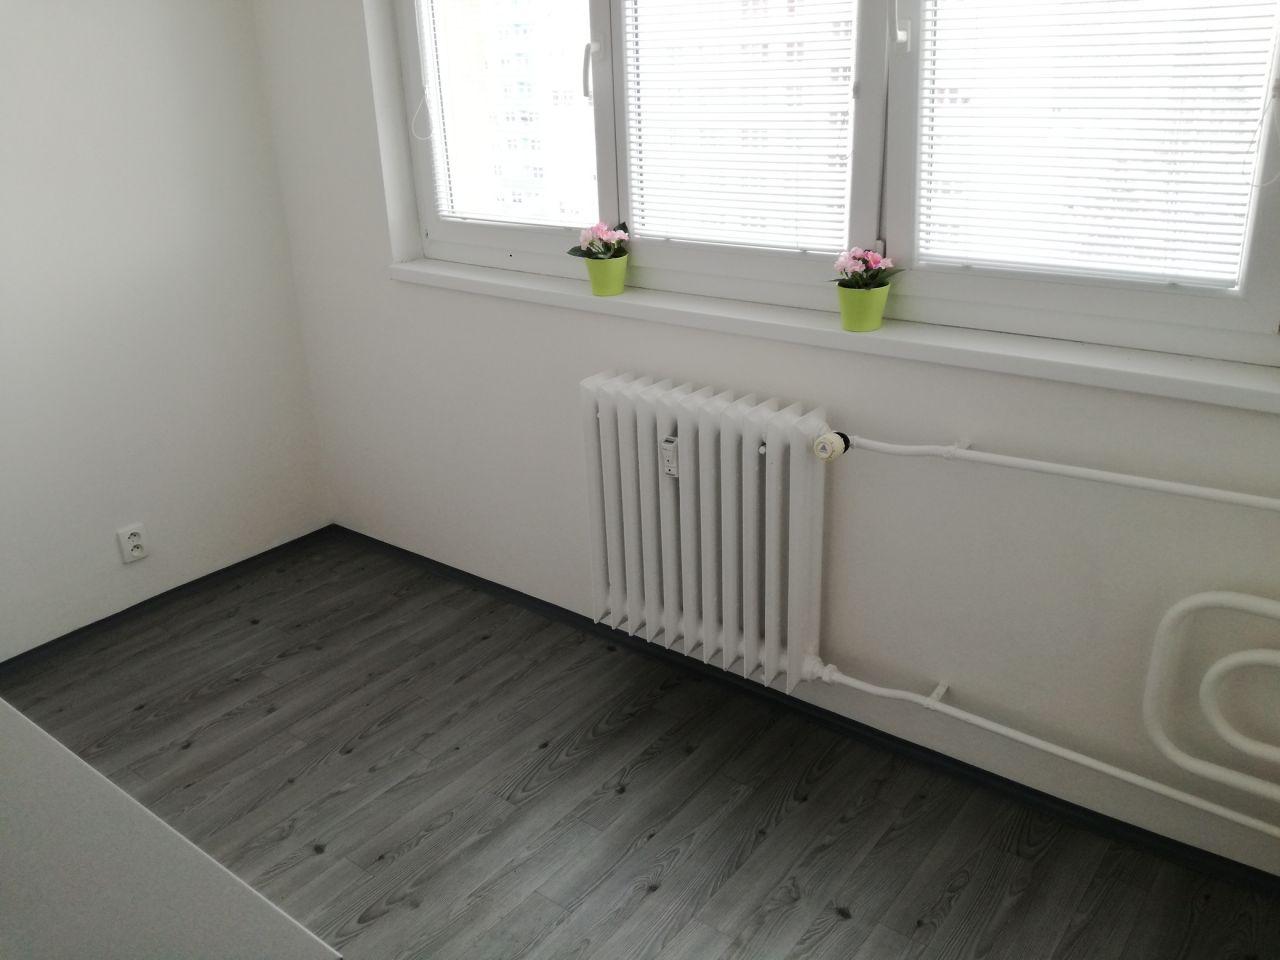 Pronájem bytu 2+1 50 m2, ul. Františka Hajdy 8, Ostrava - Hrabůvka